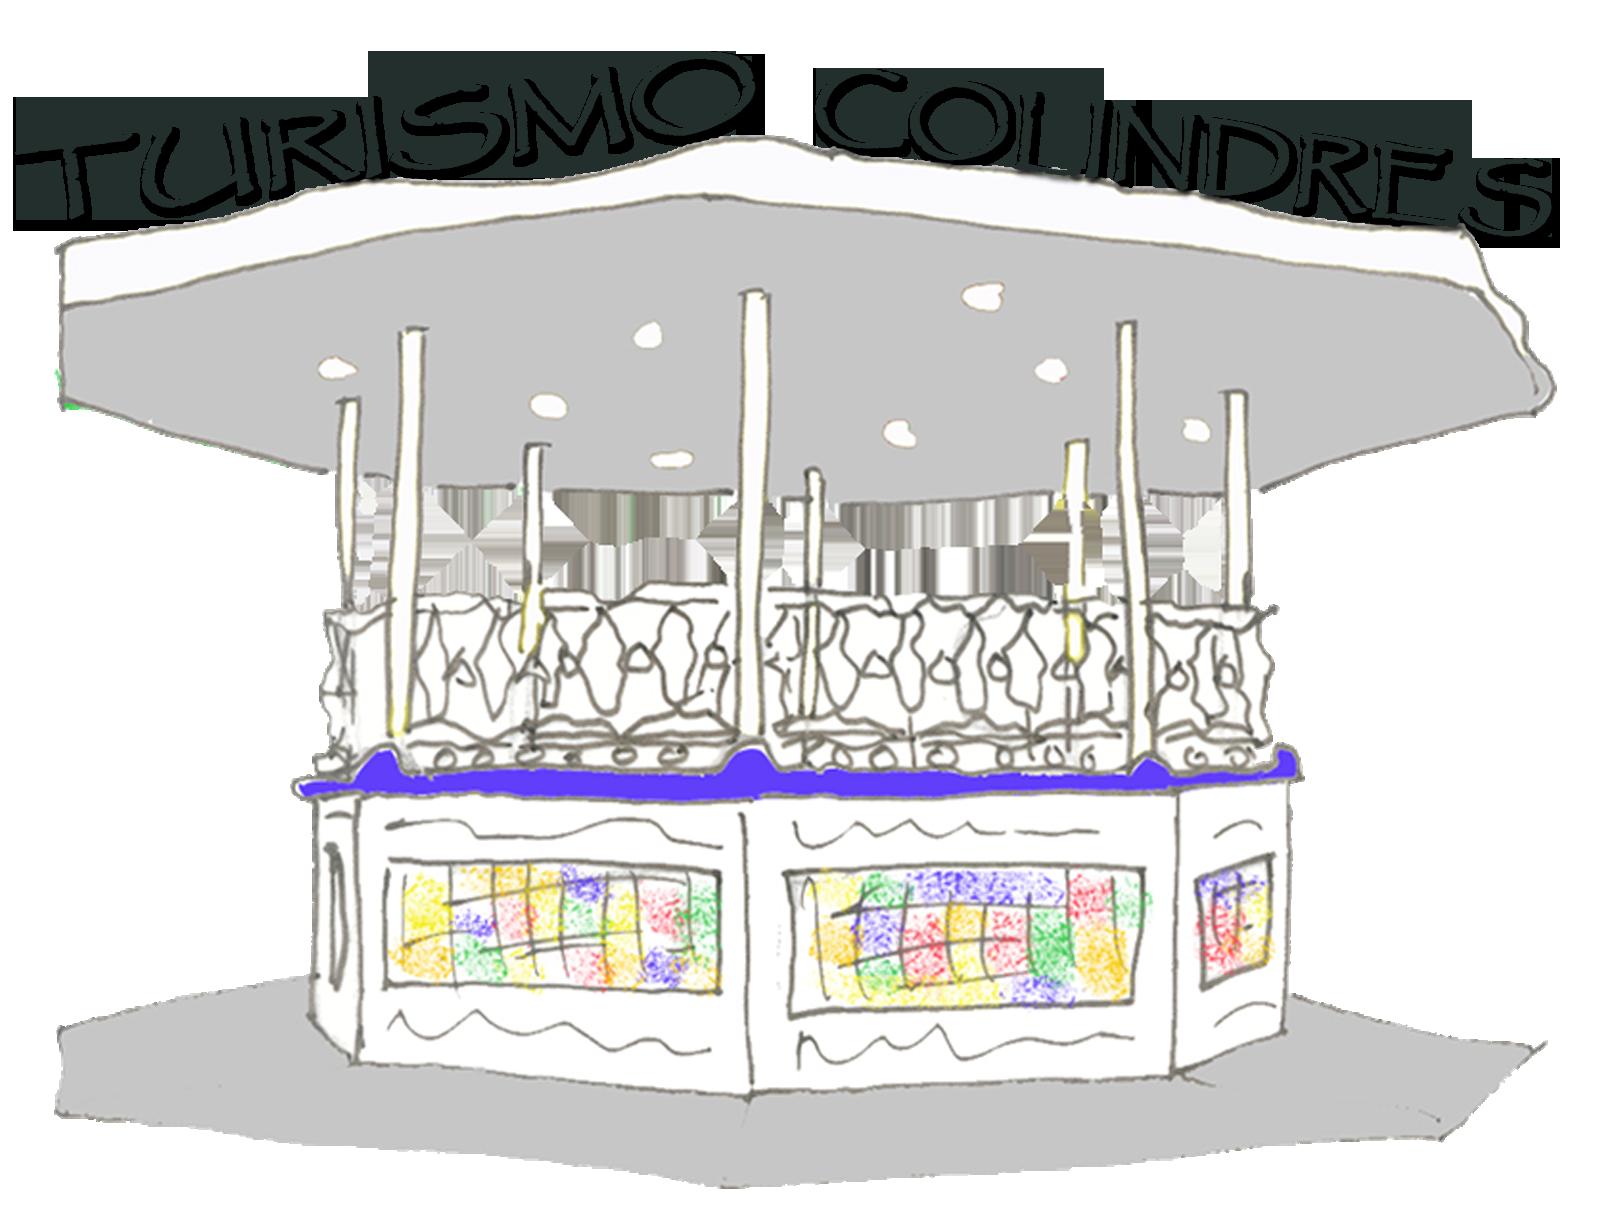 Página WEB Turismo Colindres